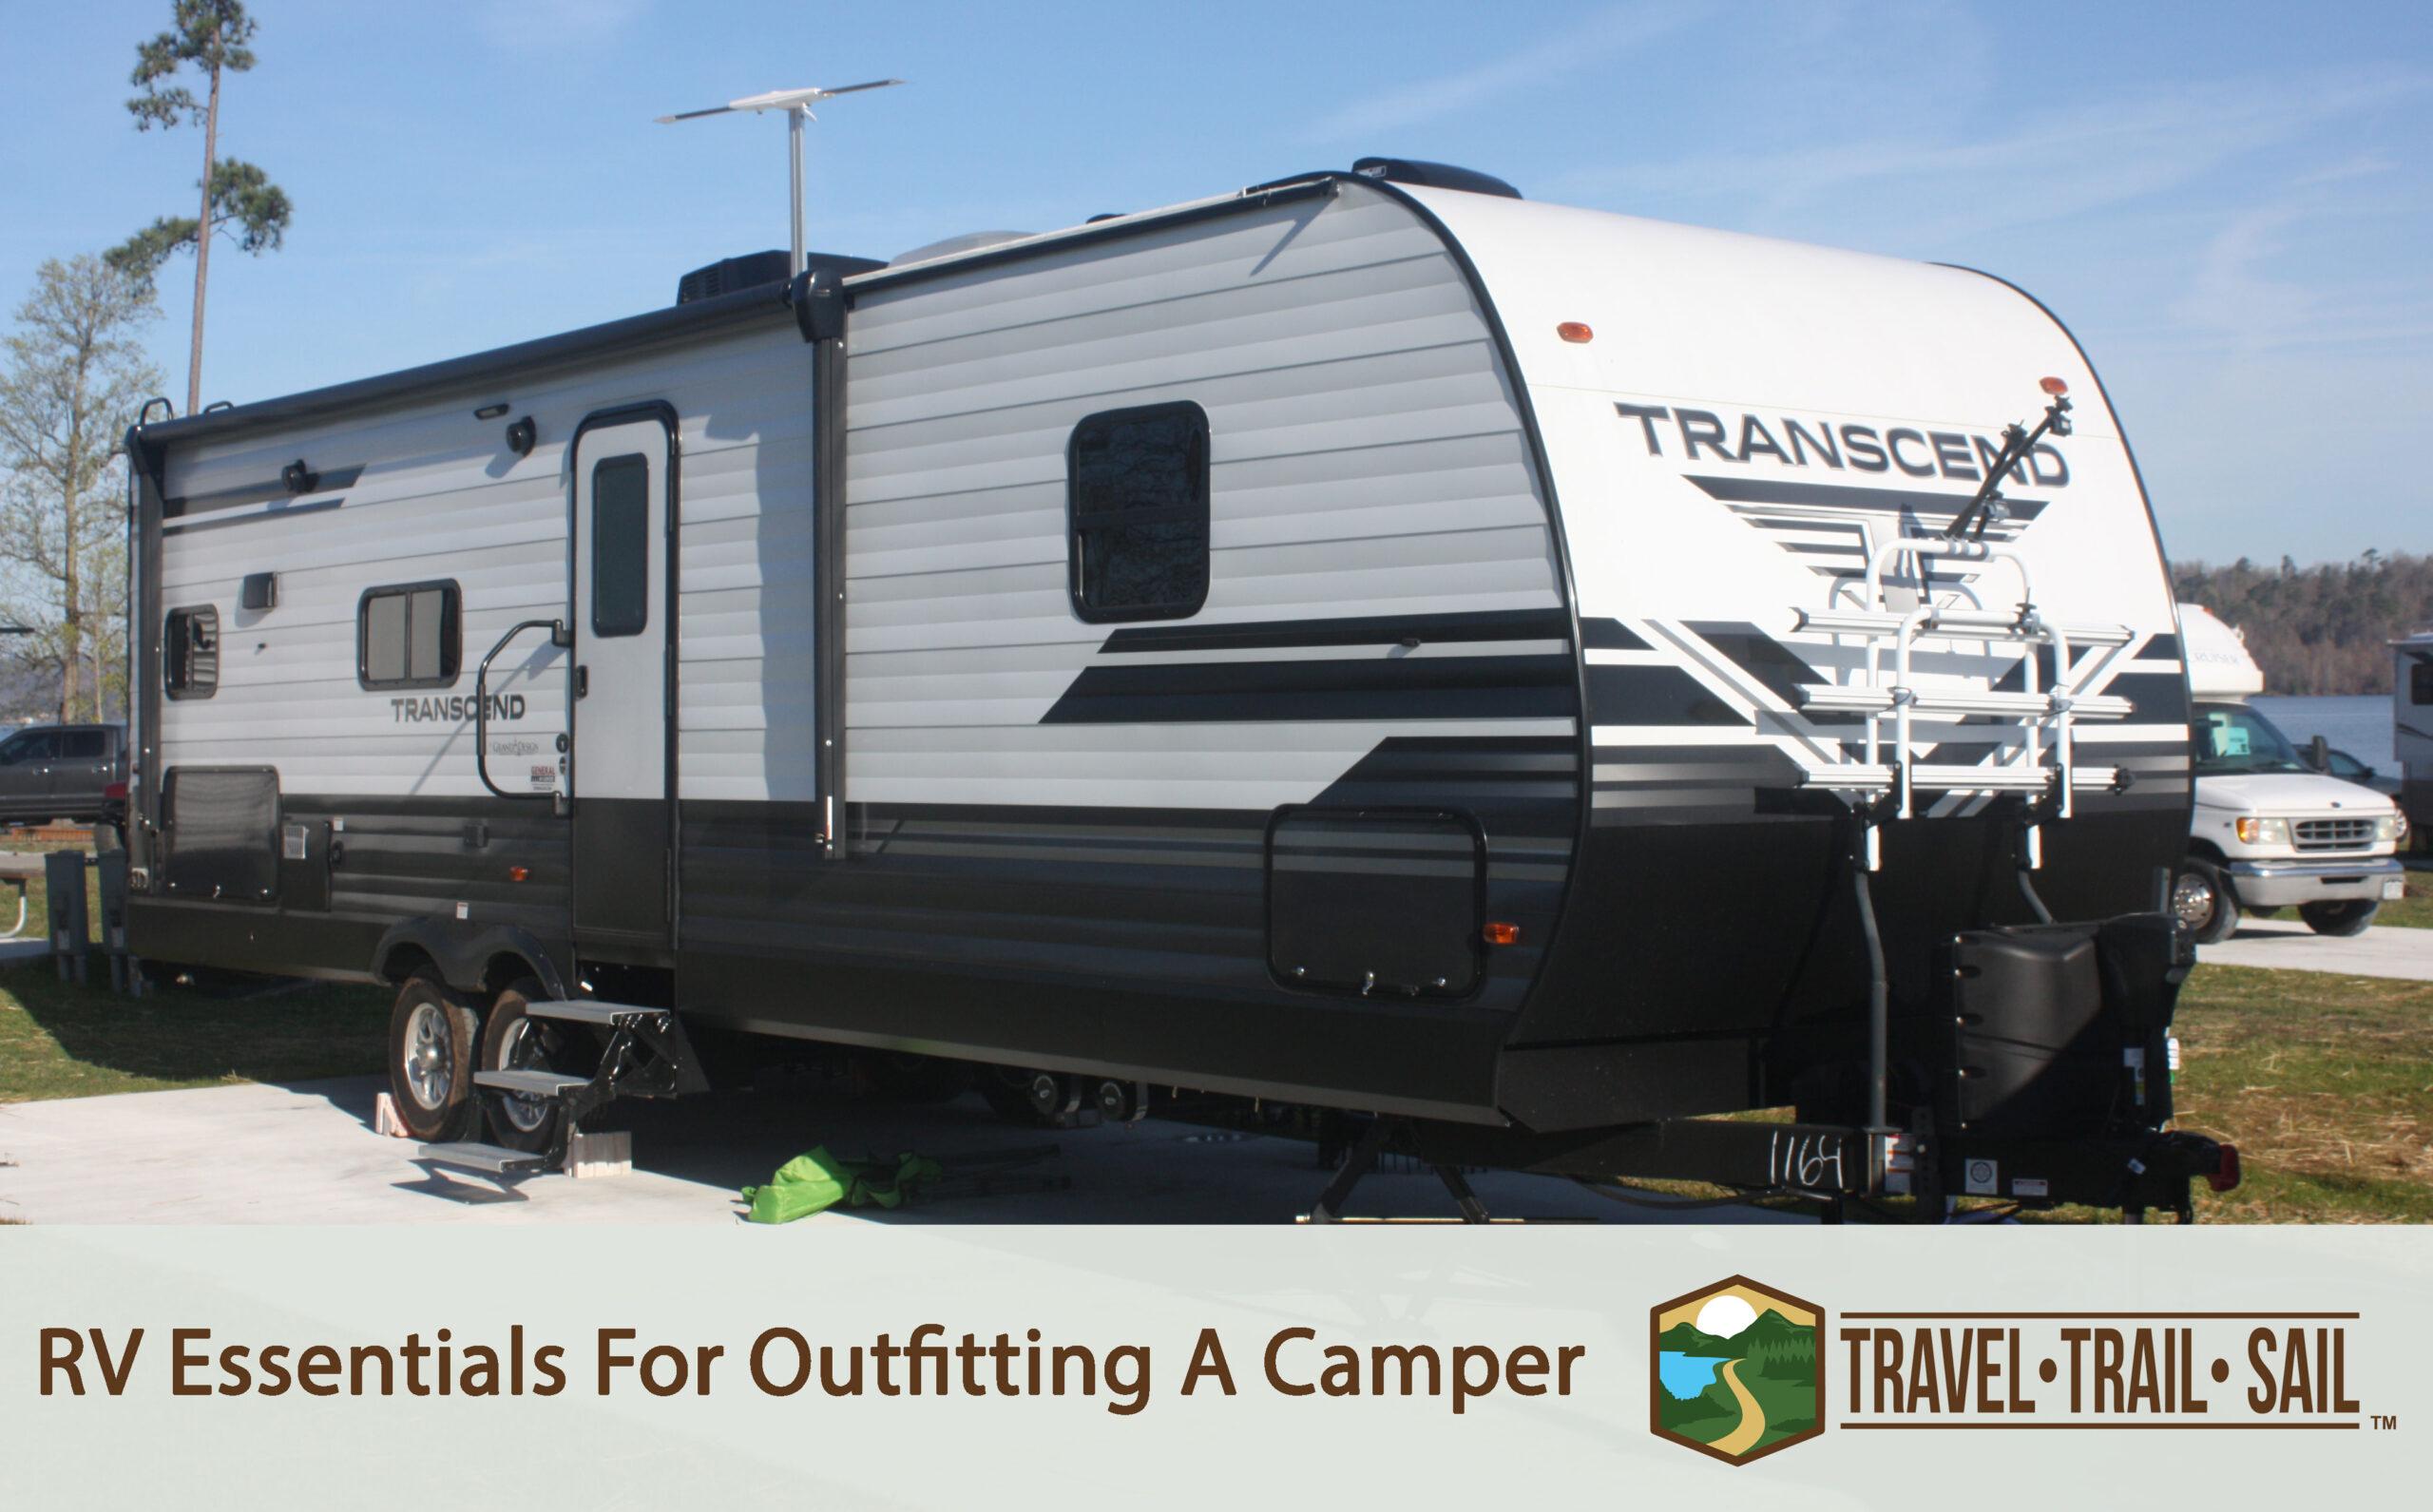 RV Essentials Outfitting A Camper